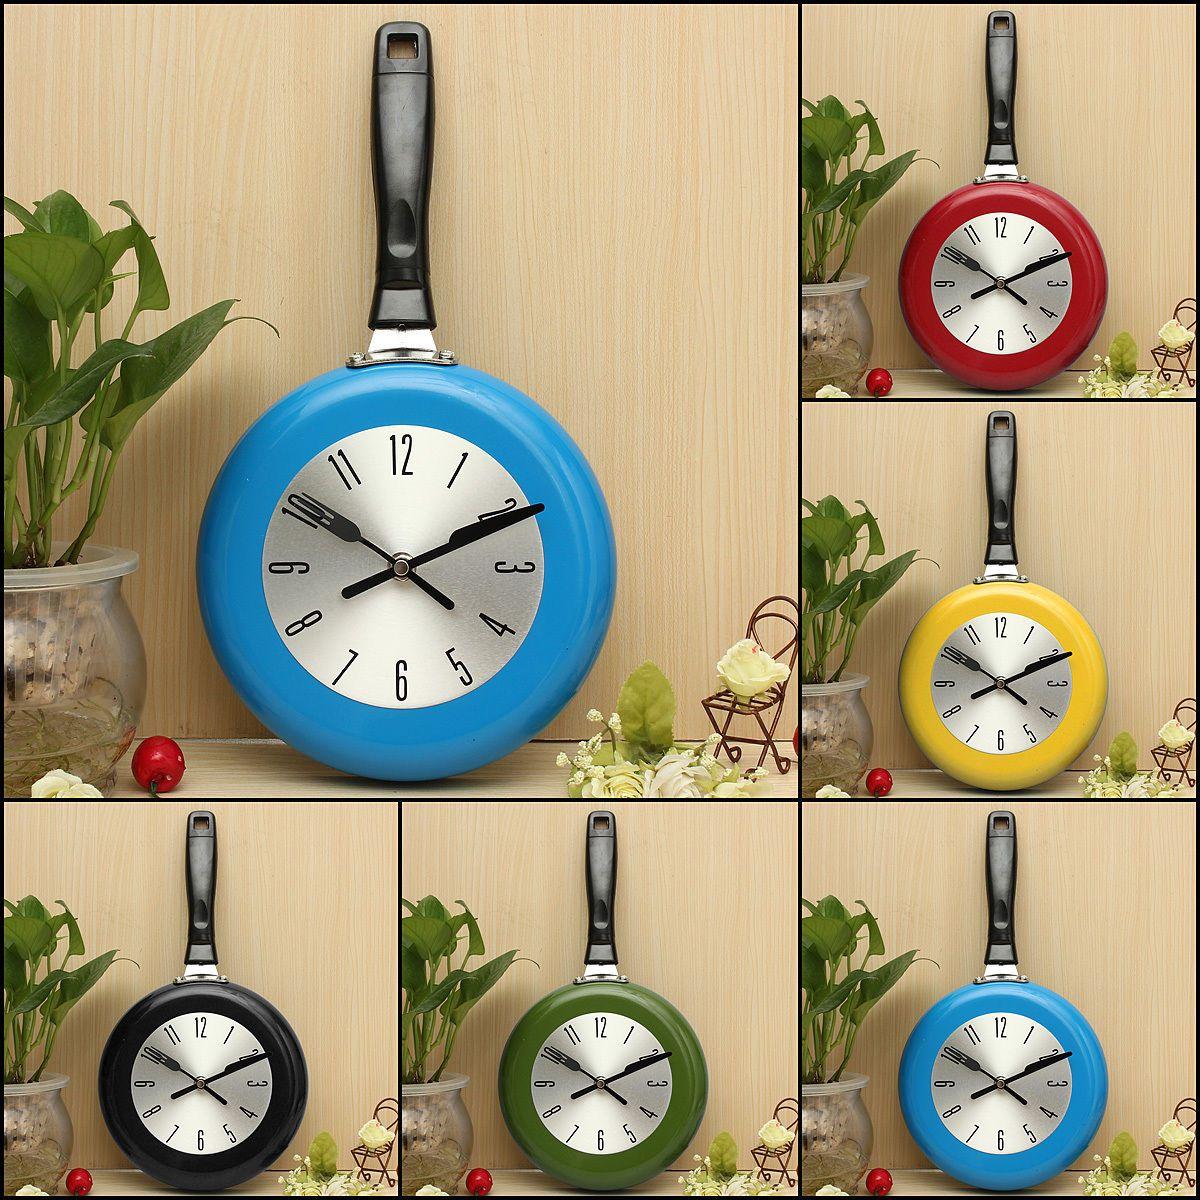 GeekGoodies Frying Pan Tawa Wall Clock